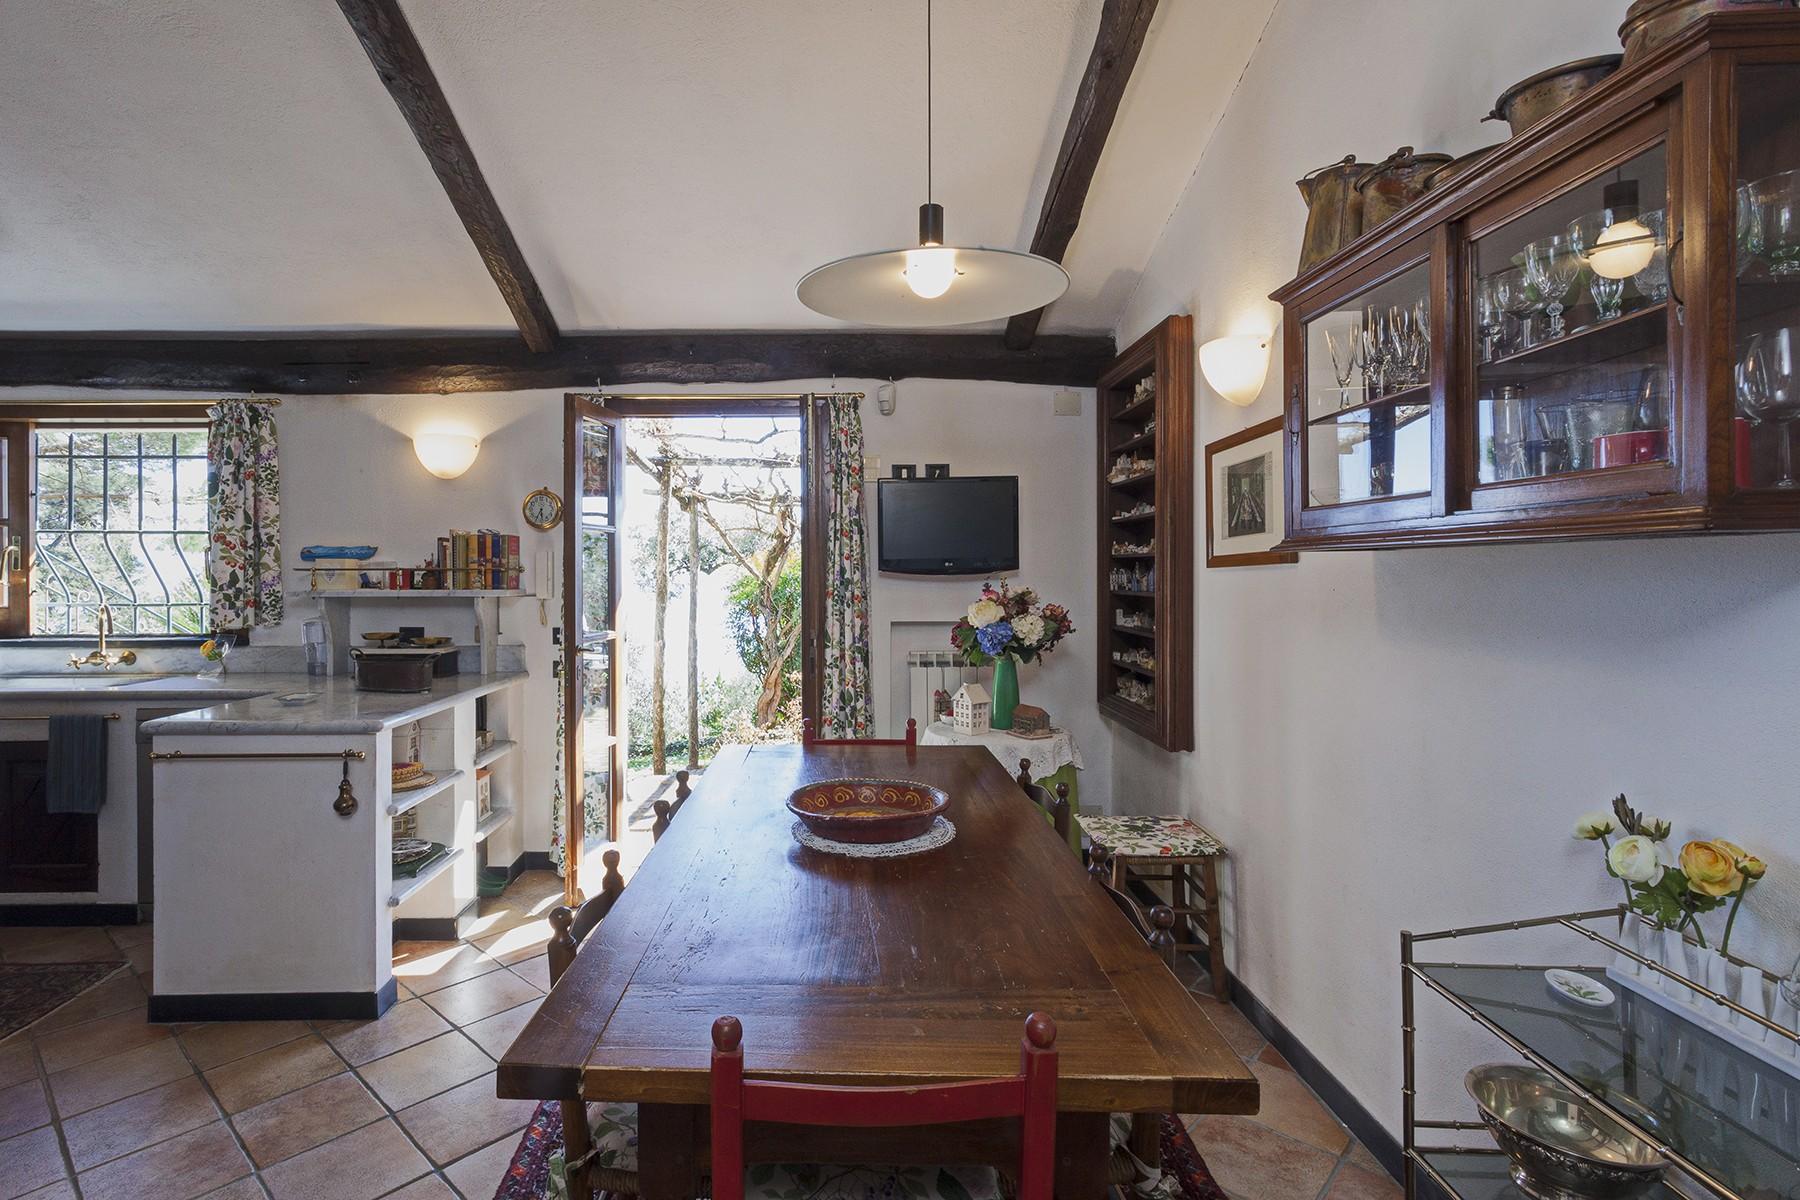 Villa in Vendita a Santa Margherita Ligure: 5 locali, 180 mq - Foto 9